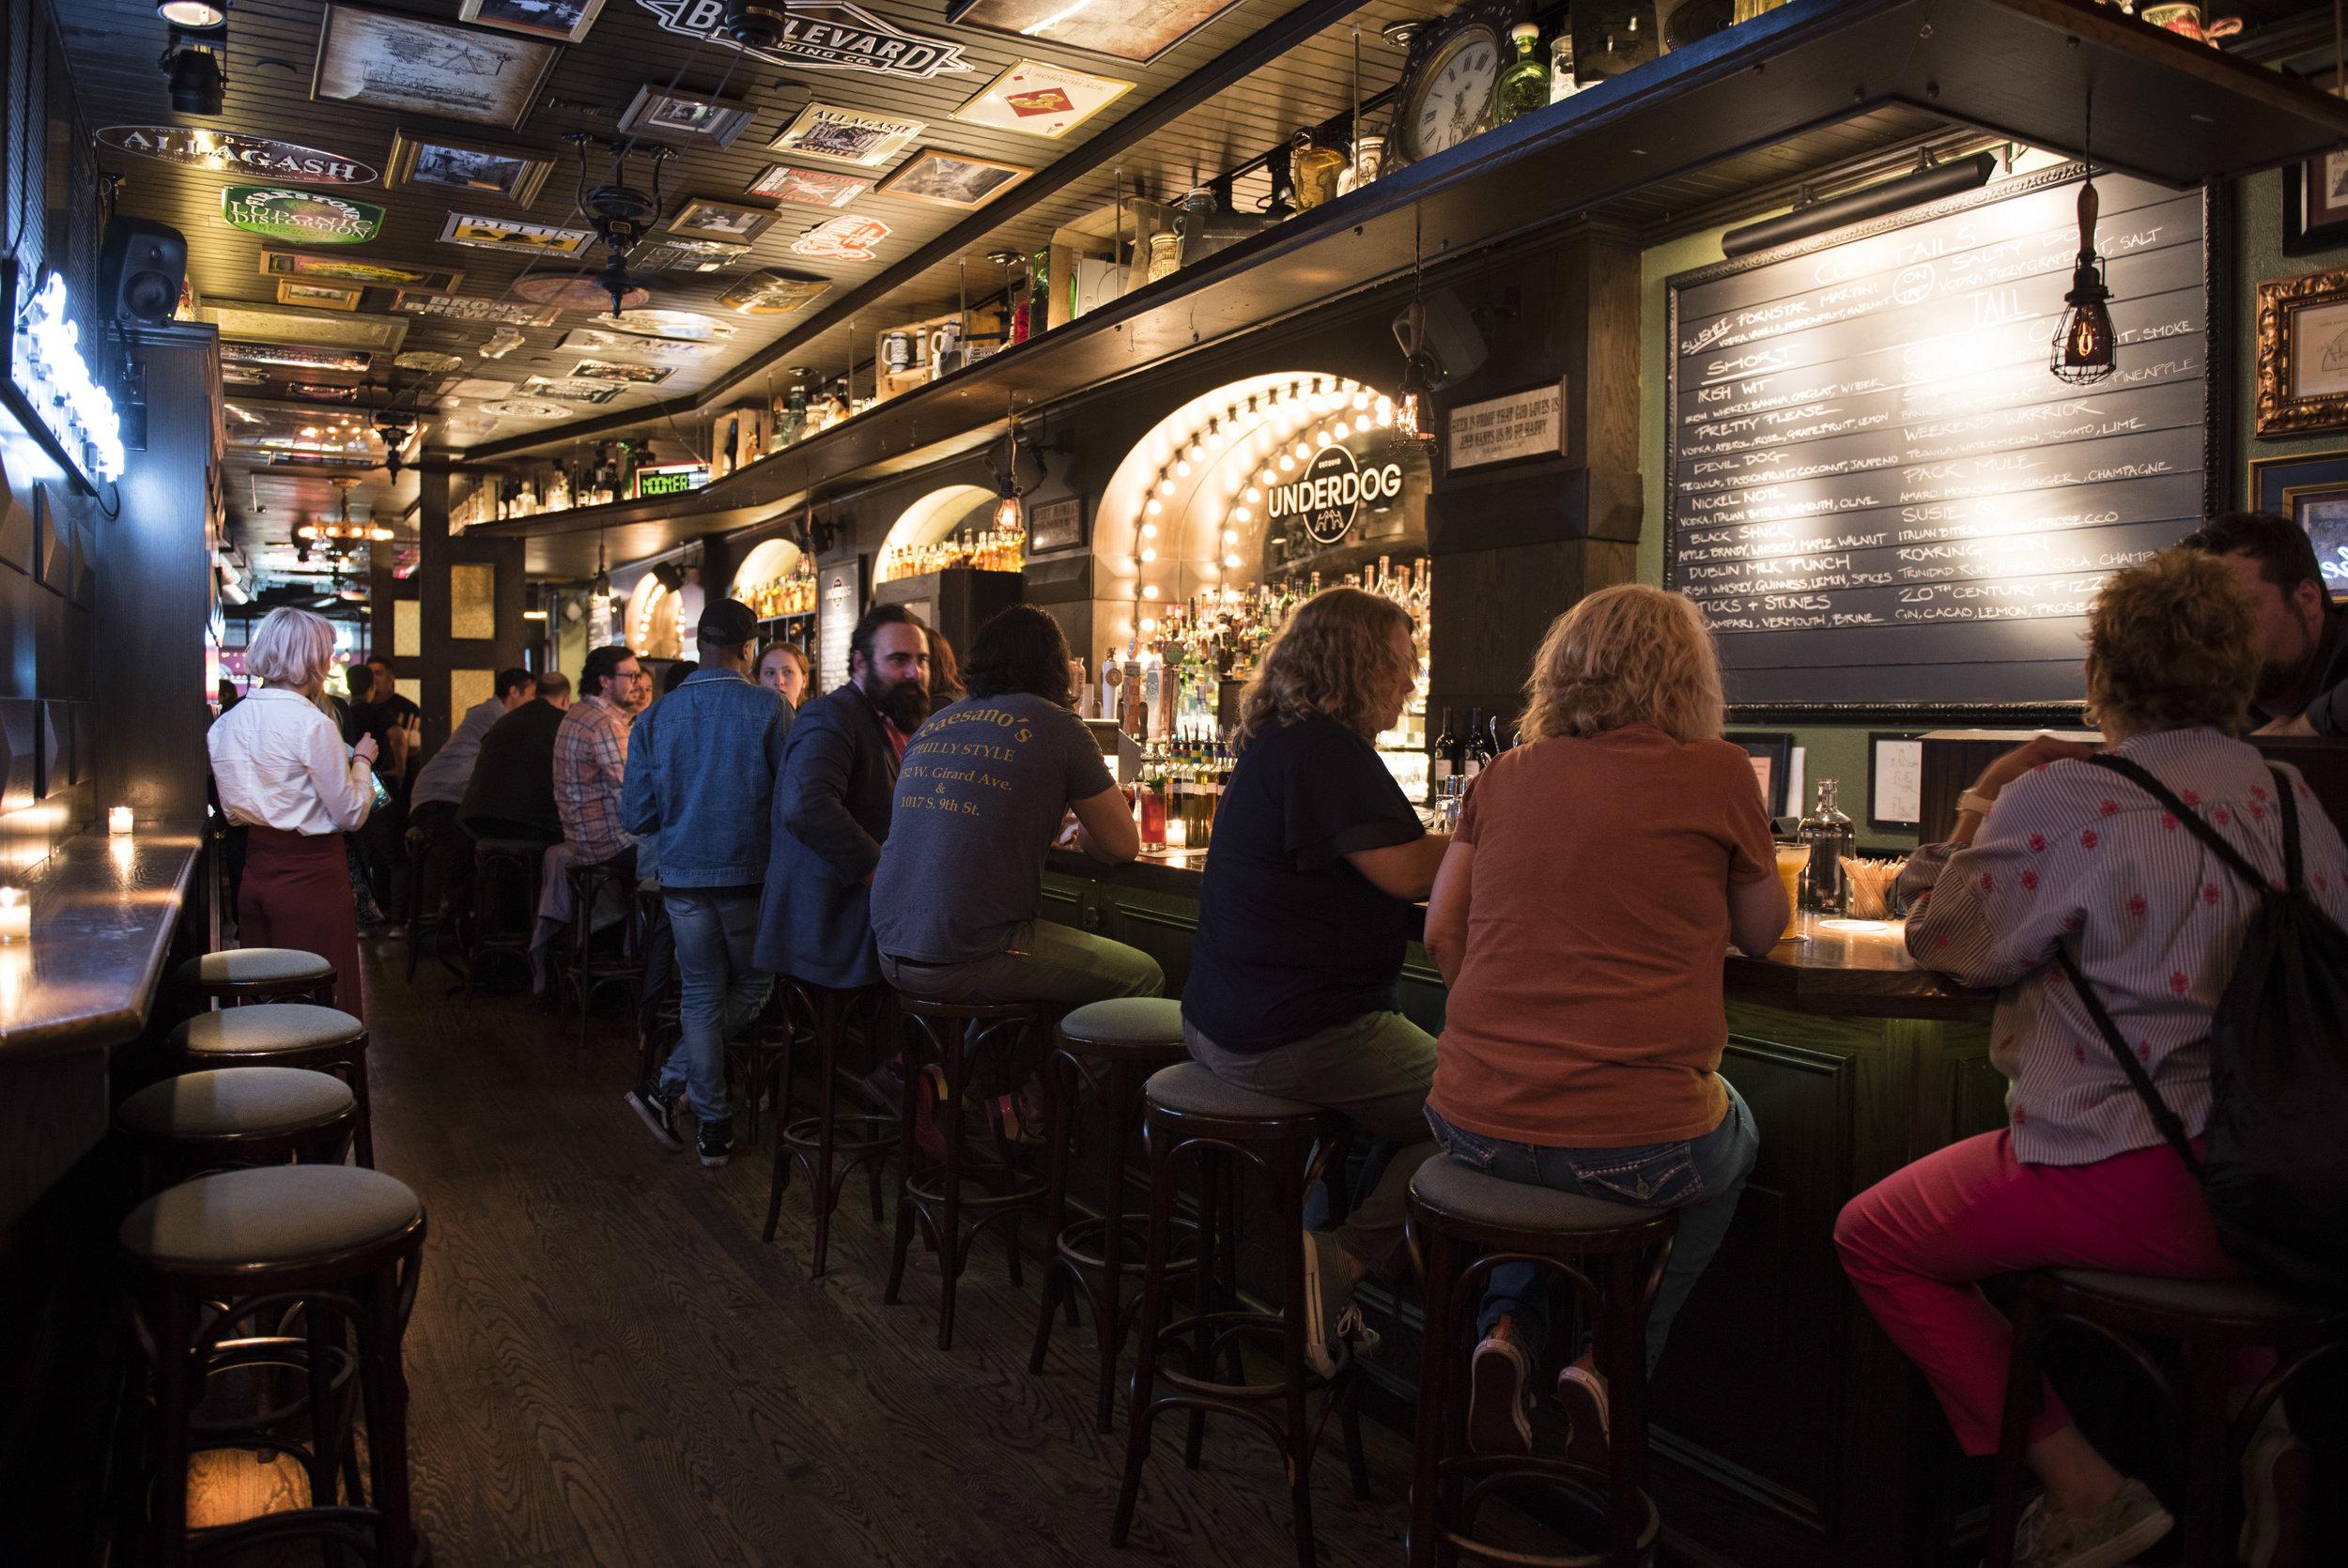 Underdog's Main Bar, Upstairs (Courtesy of Underdog)